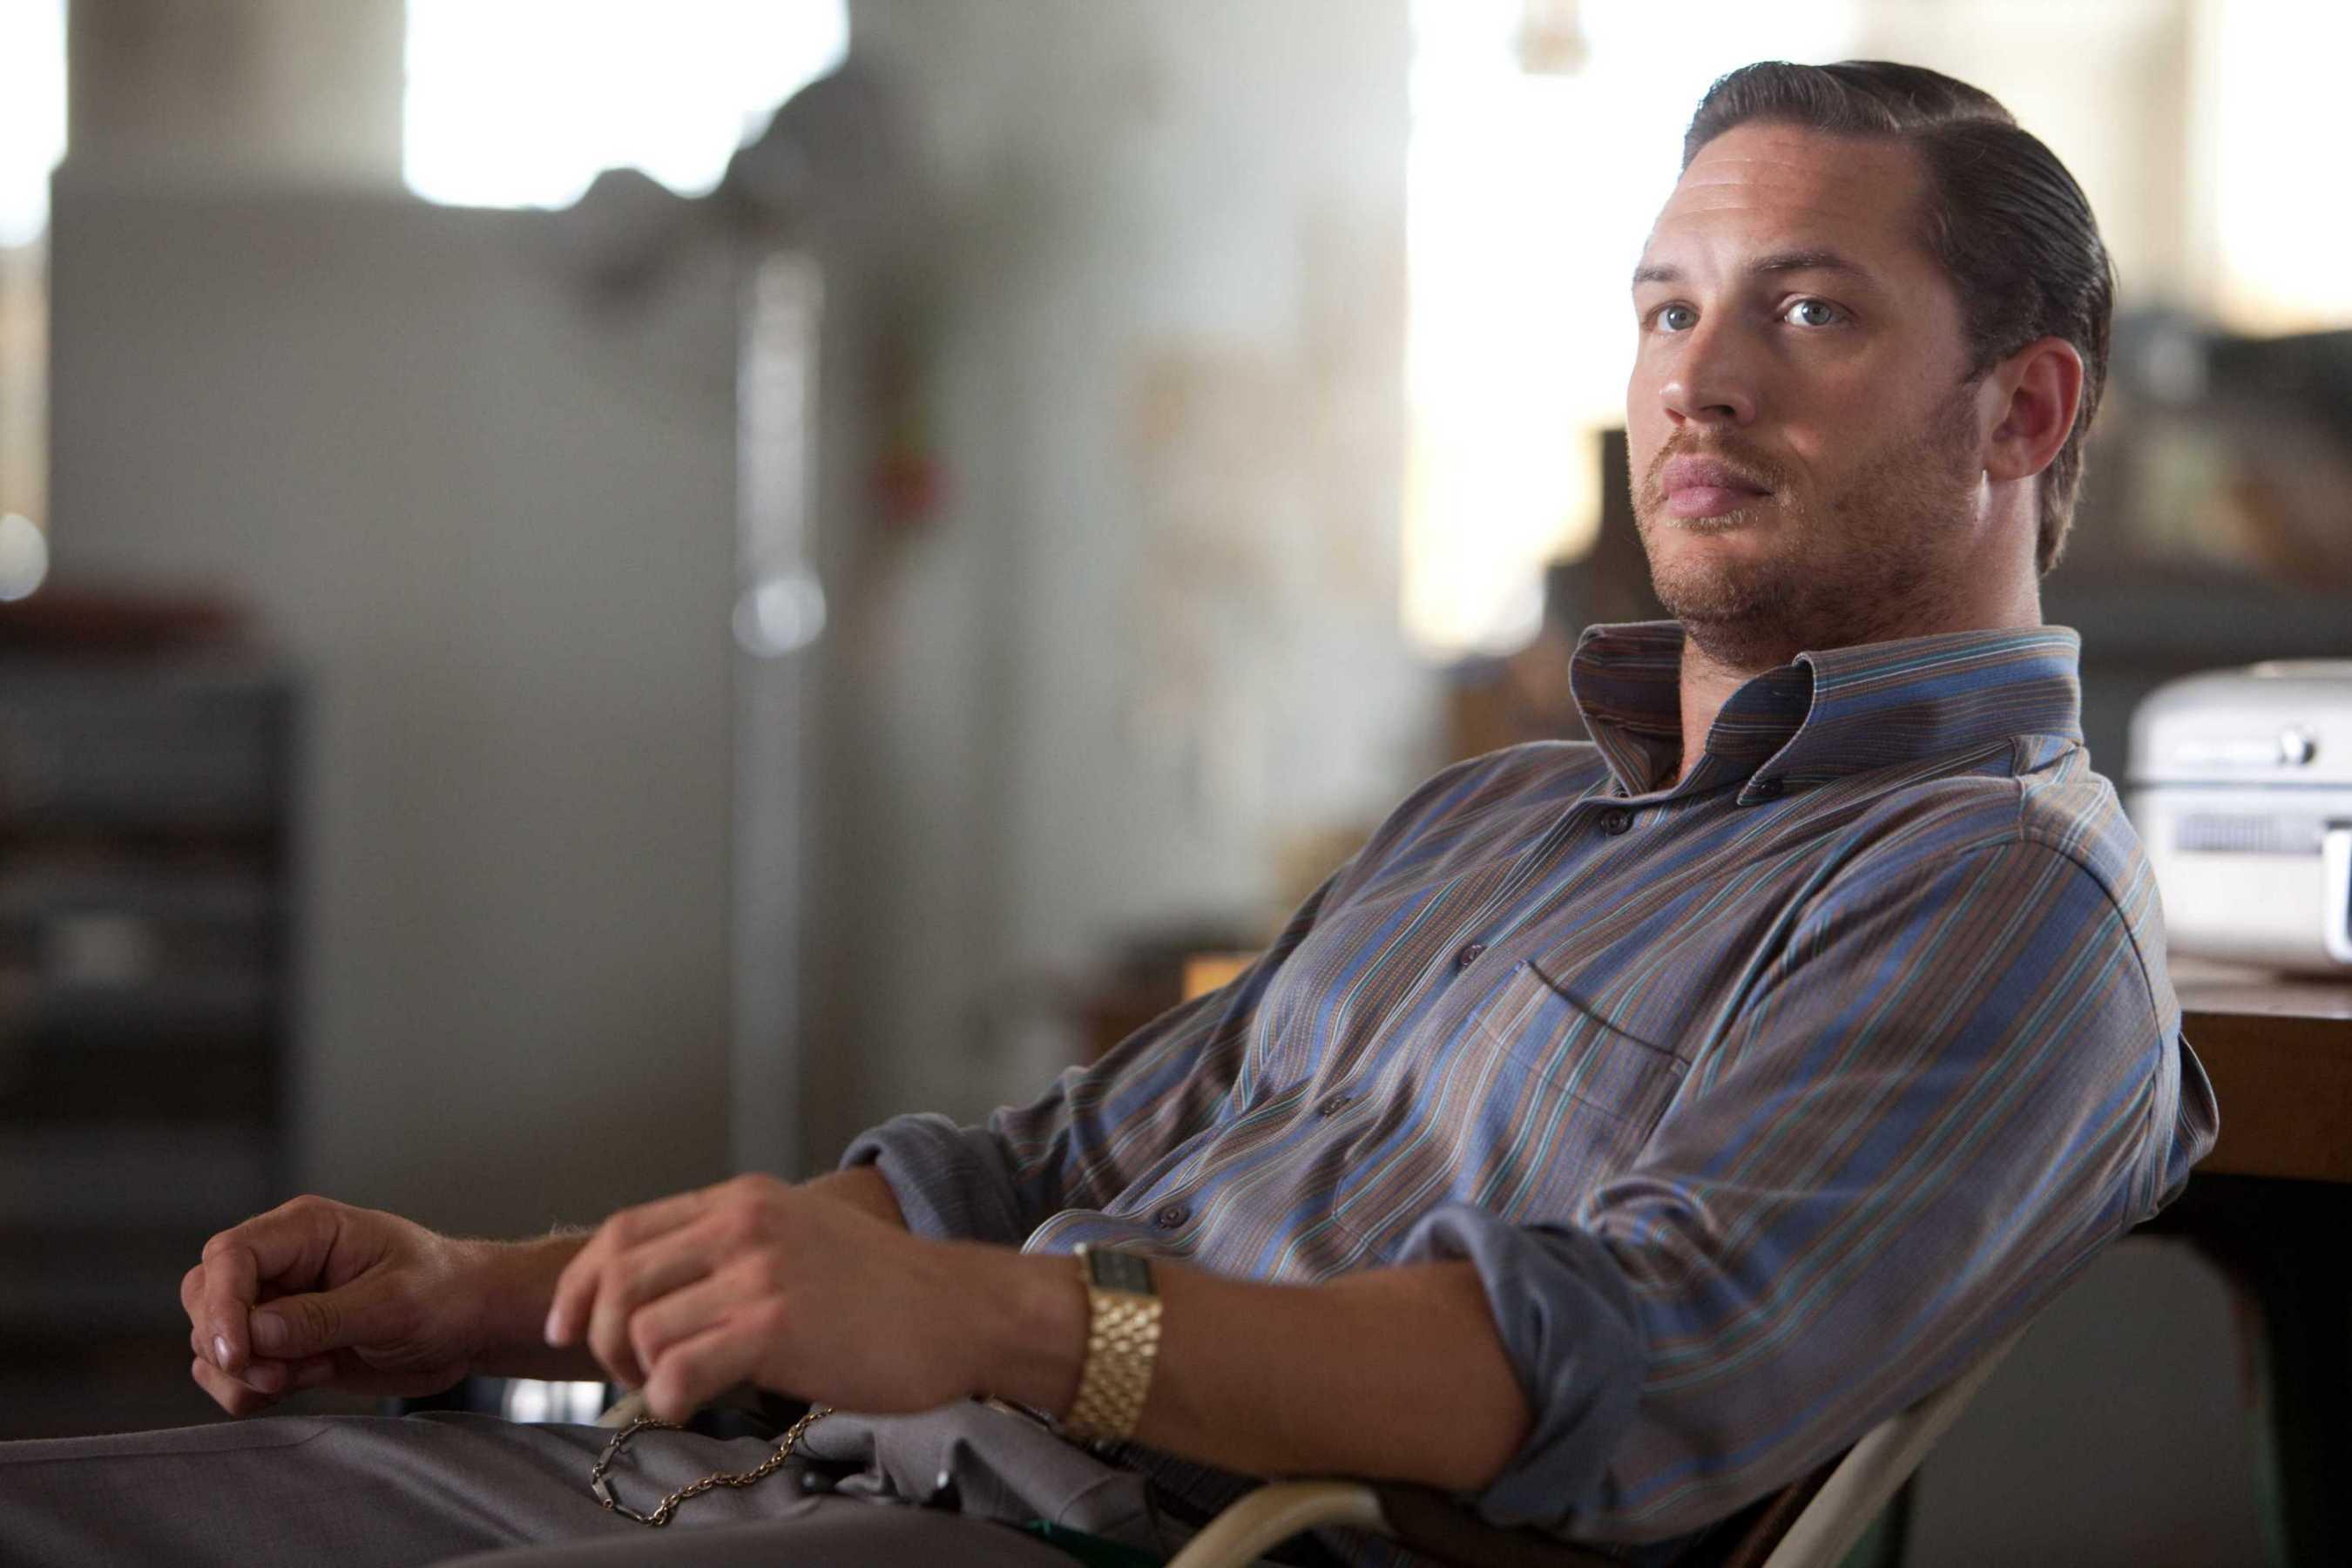 Sam Fisher será encarnado por Tom Hardy en la película de Splinter Cell